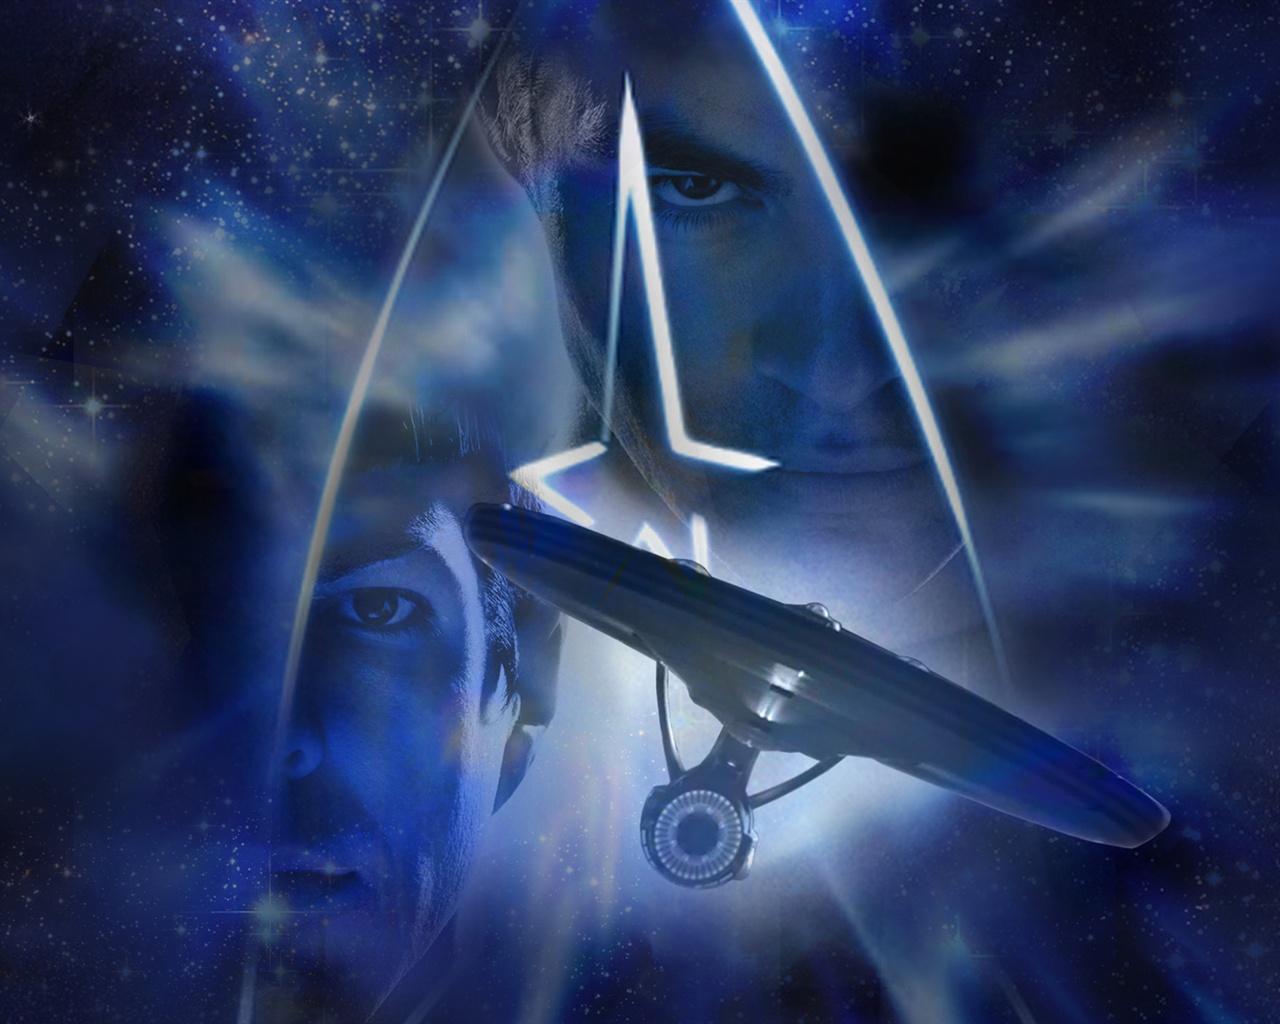 Download Wallpaper 1280x1024 Star Trek Into Darkness 2013 ...